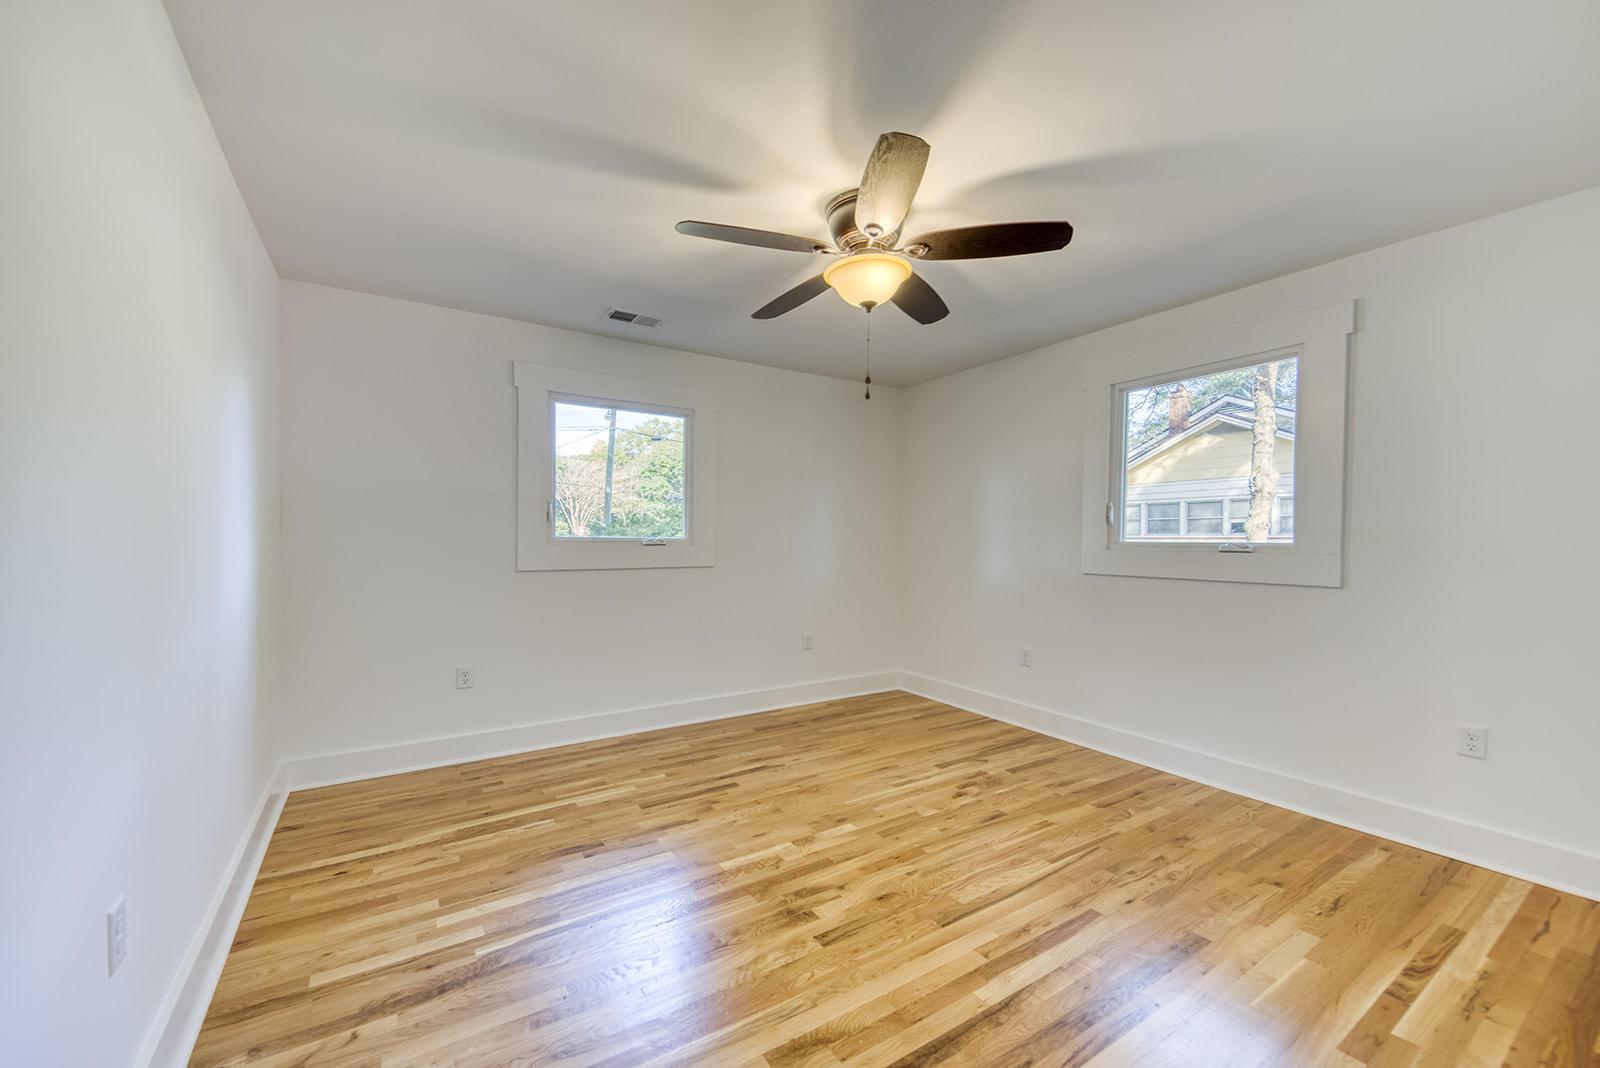 Bay View Acres Homes For Sale - 265 Coleman, Mount Pleasant, SC - 59